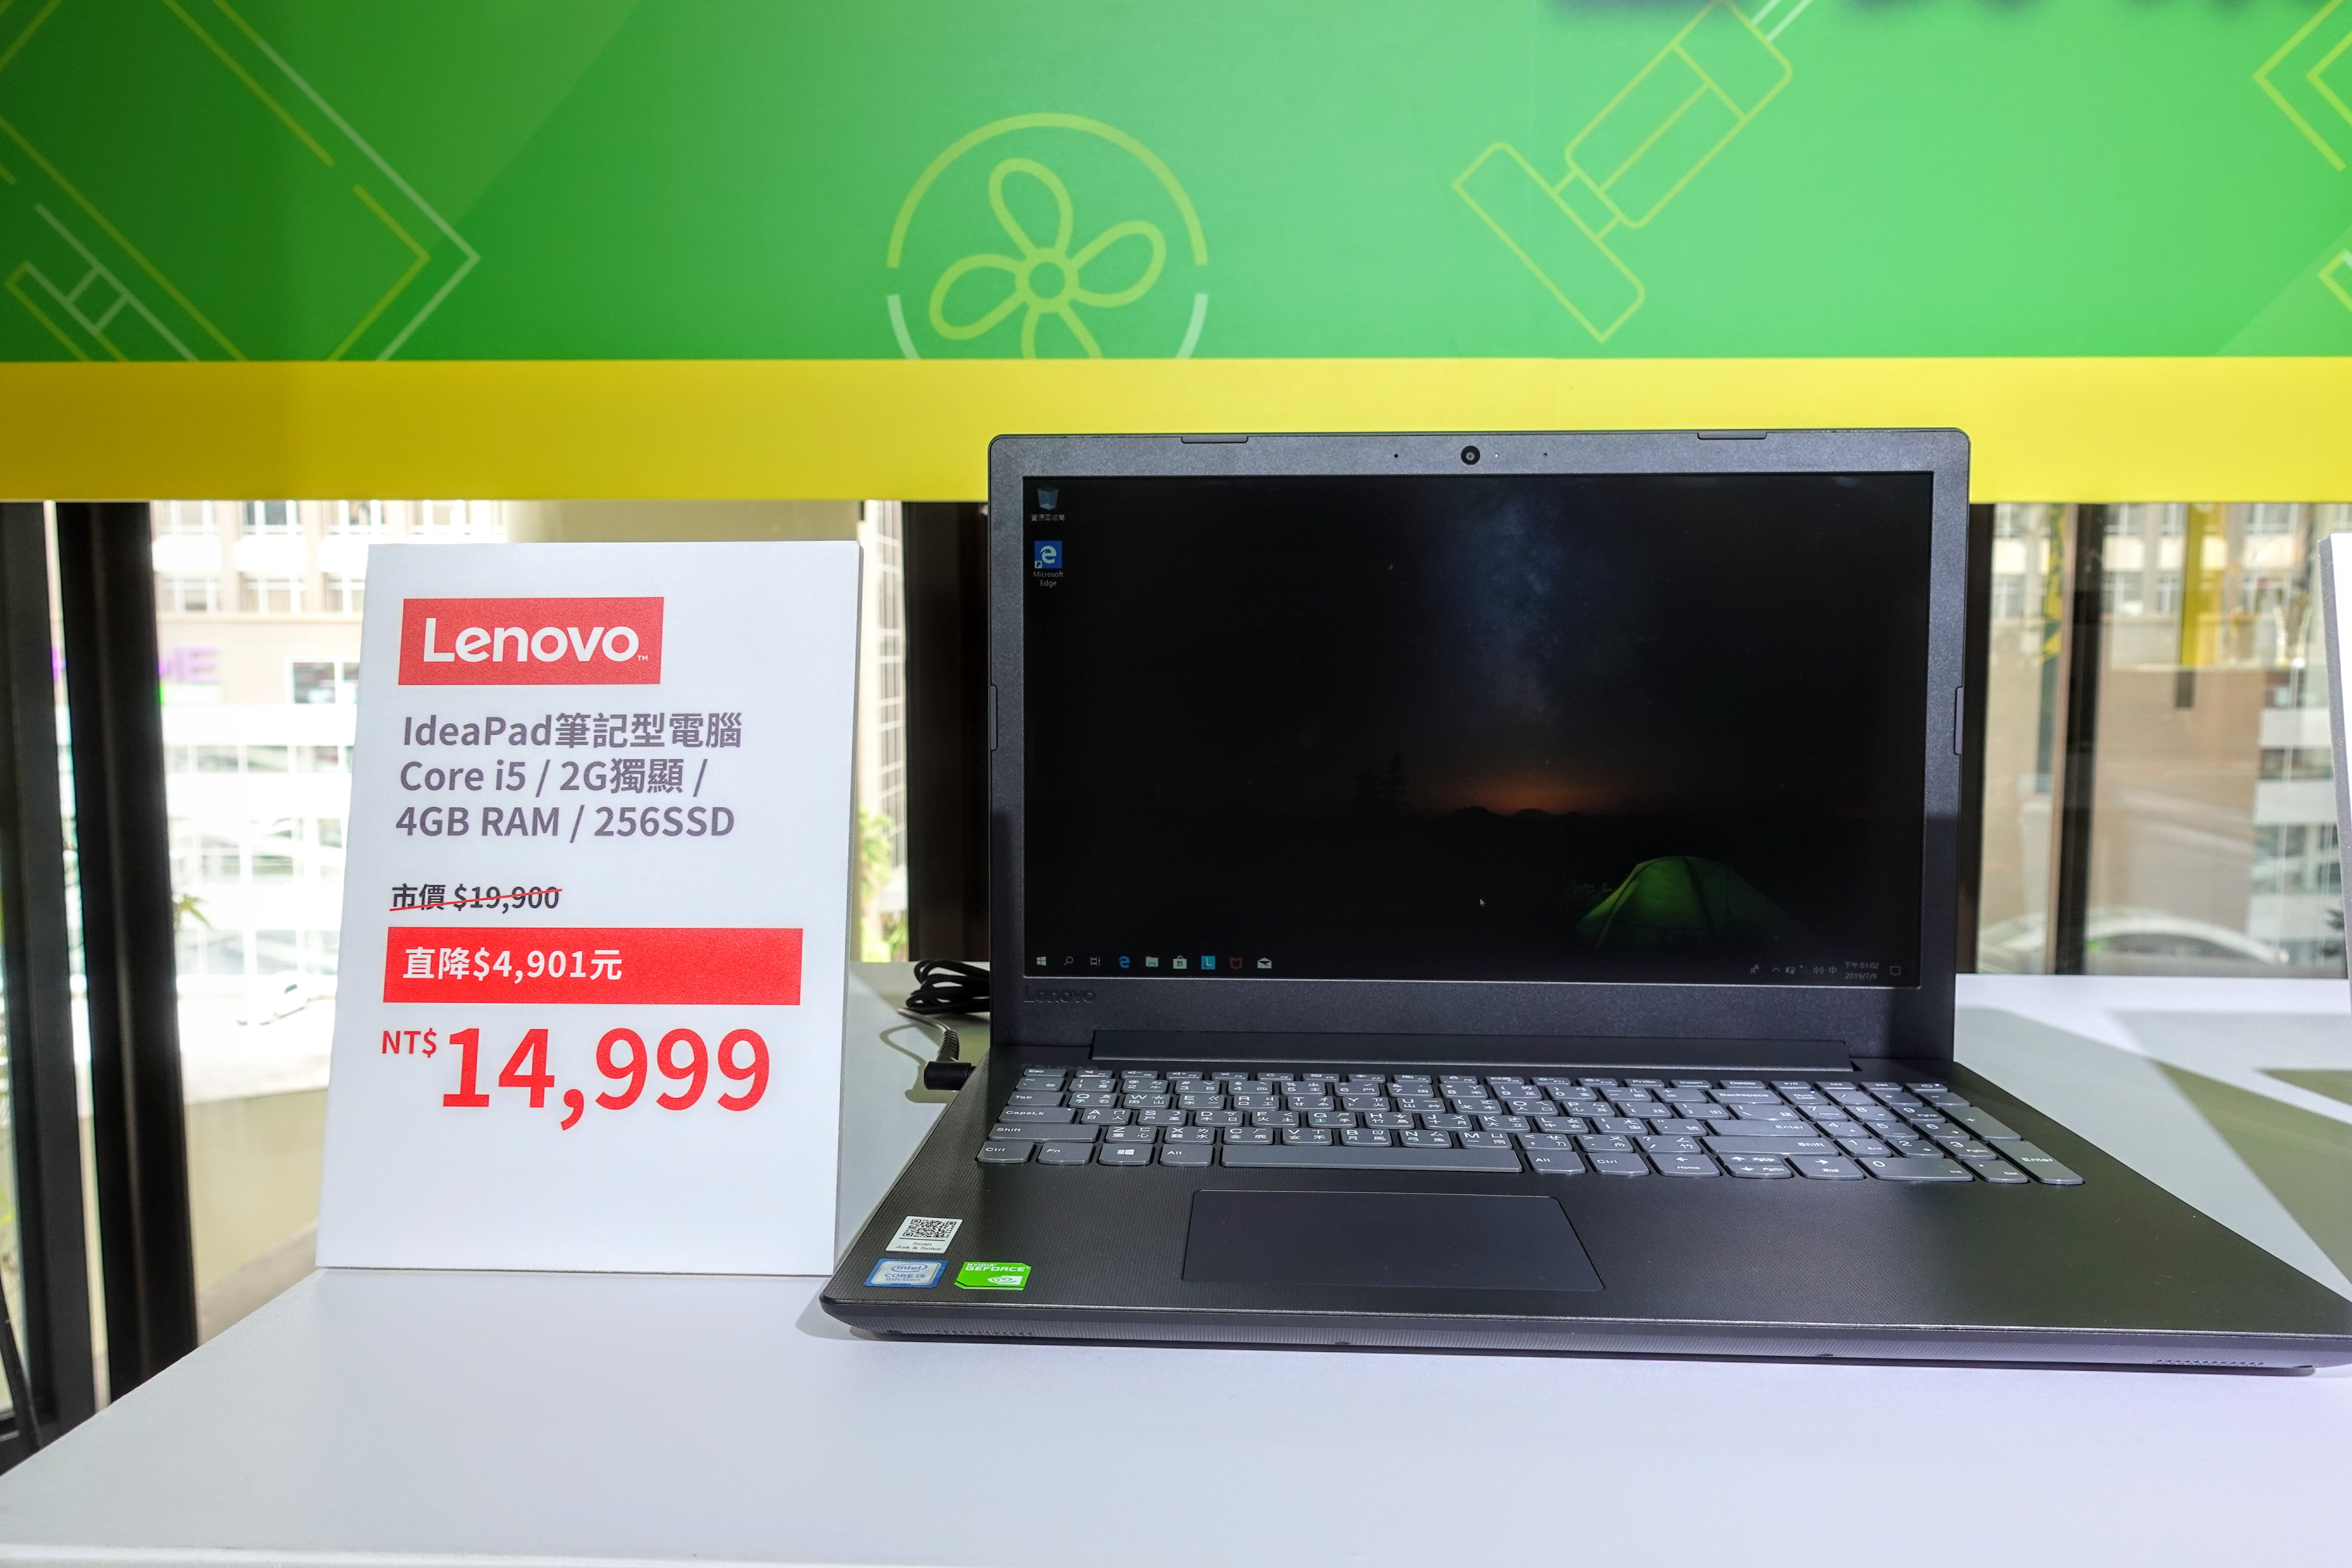 Lenovo IdeaPad筆記型電腦,優惠價NT$14,999